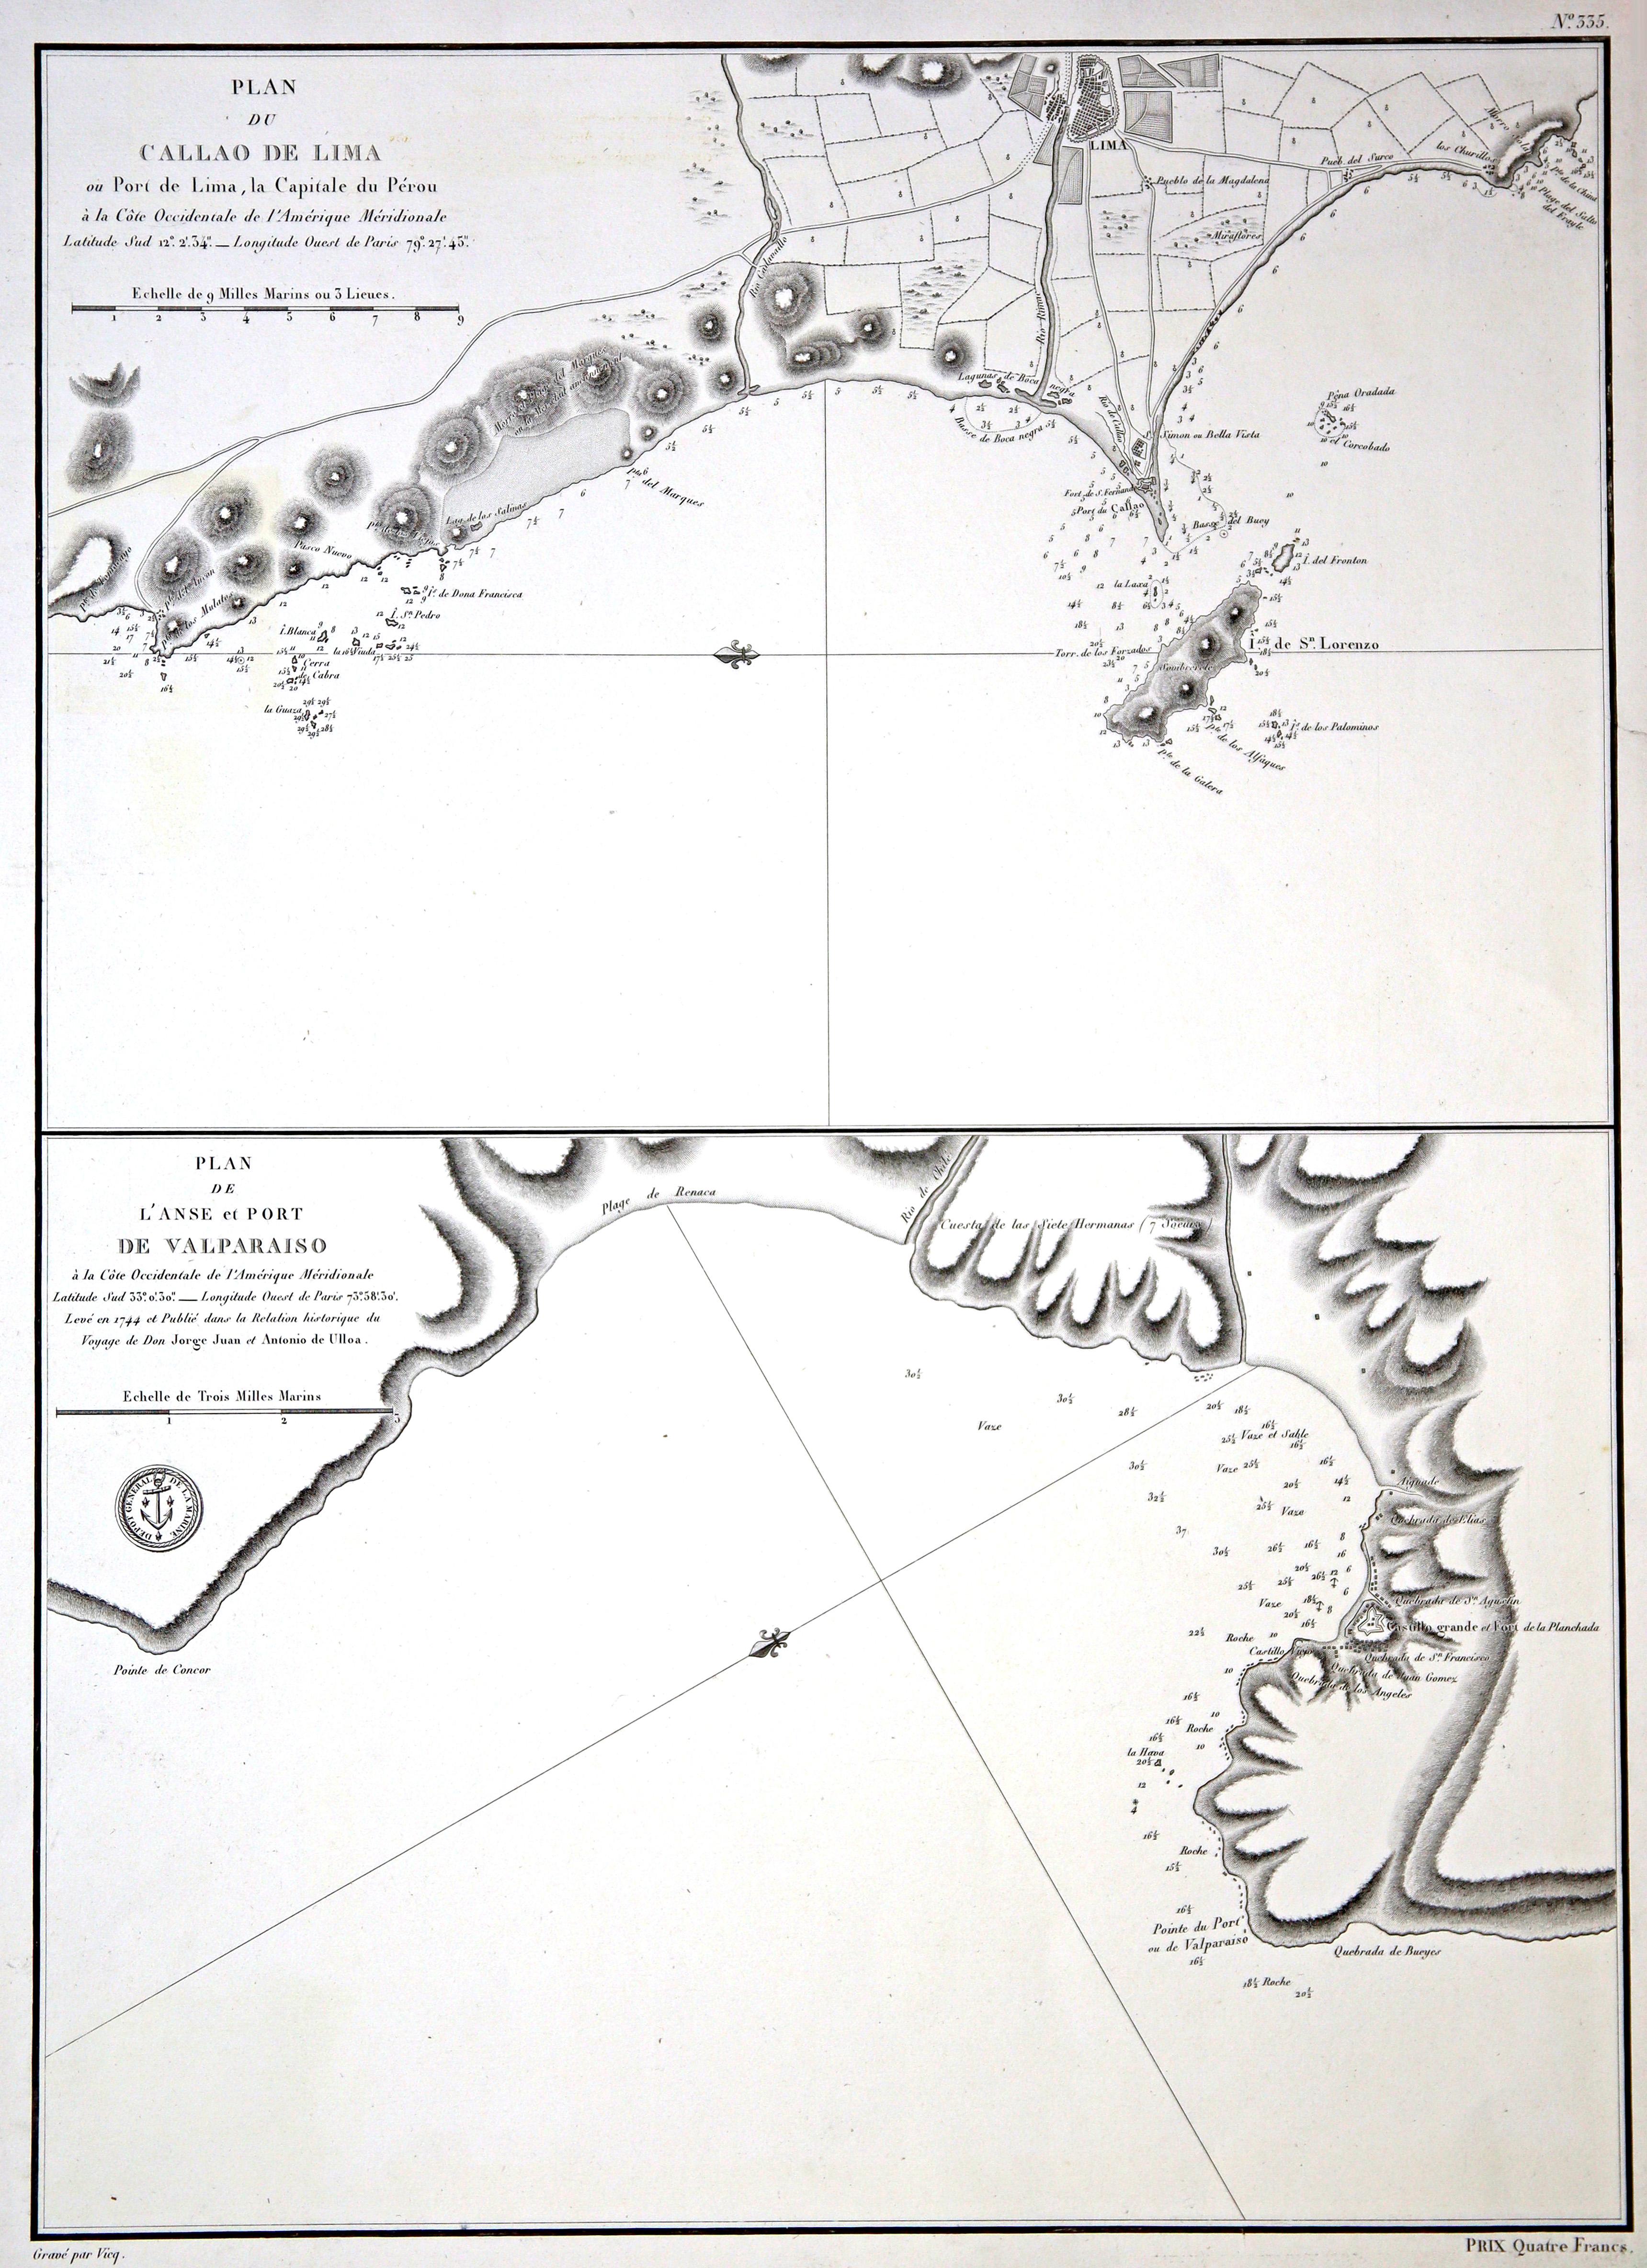 Kst.- Karte v. Vicq im Depot General: Peru - Chile: